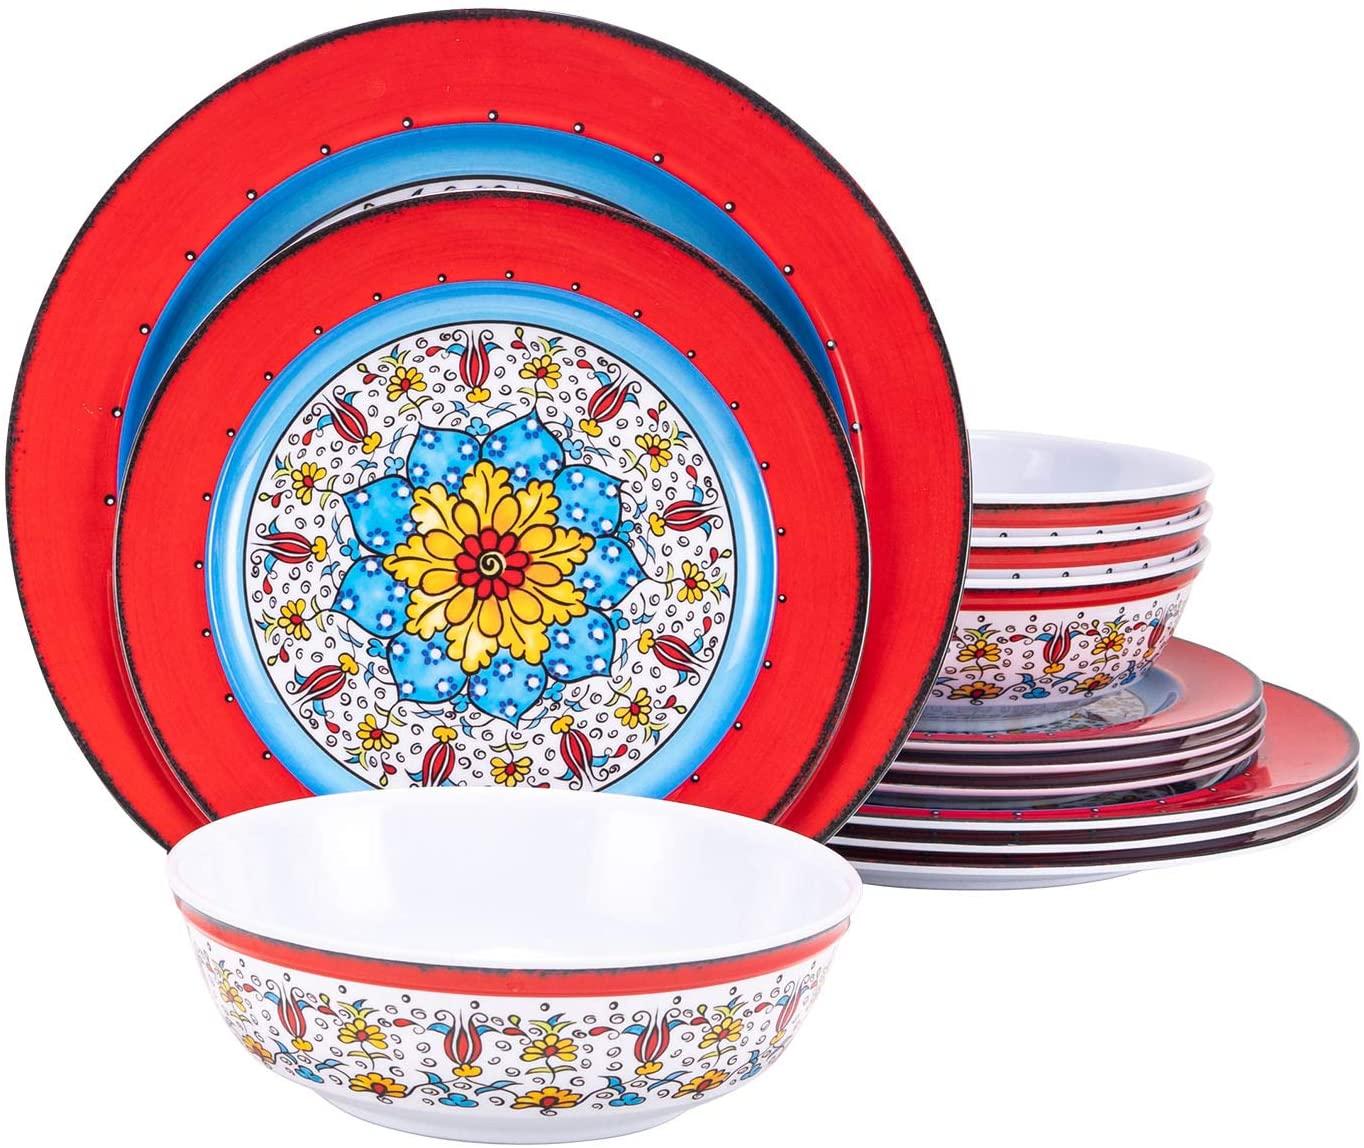 Melamine Dinnerware Set 12 Pcs Floral Red Plate Bowl Set Durable Dishware Dishwasher Safe Shatter Proof Chip Resistant Not Microware Not Oven